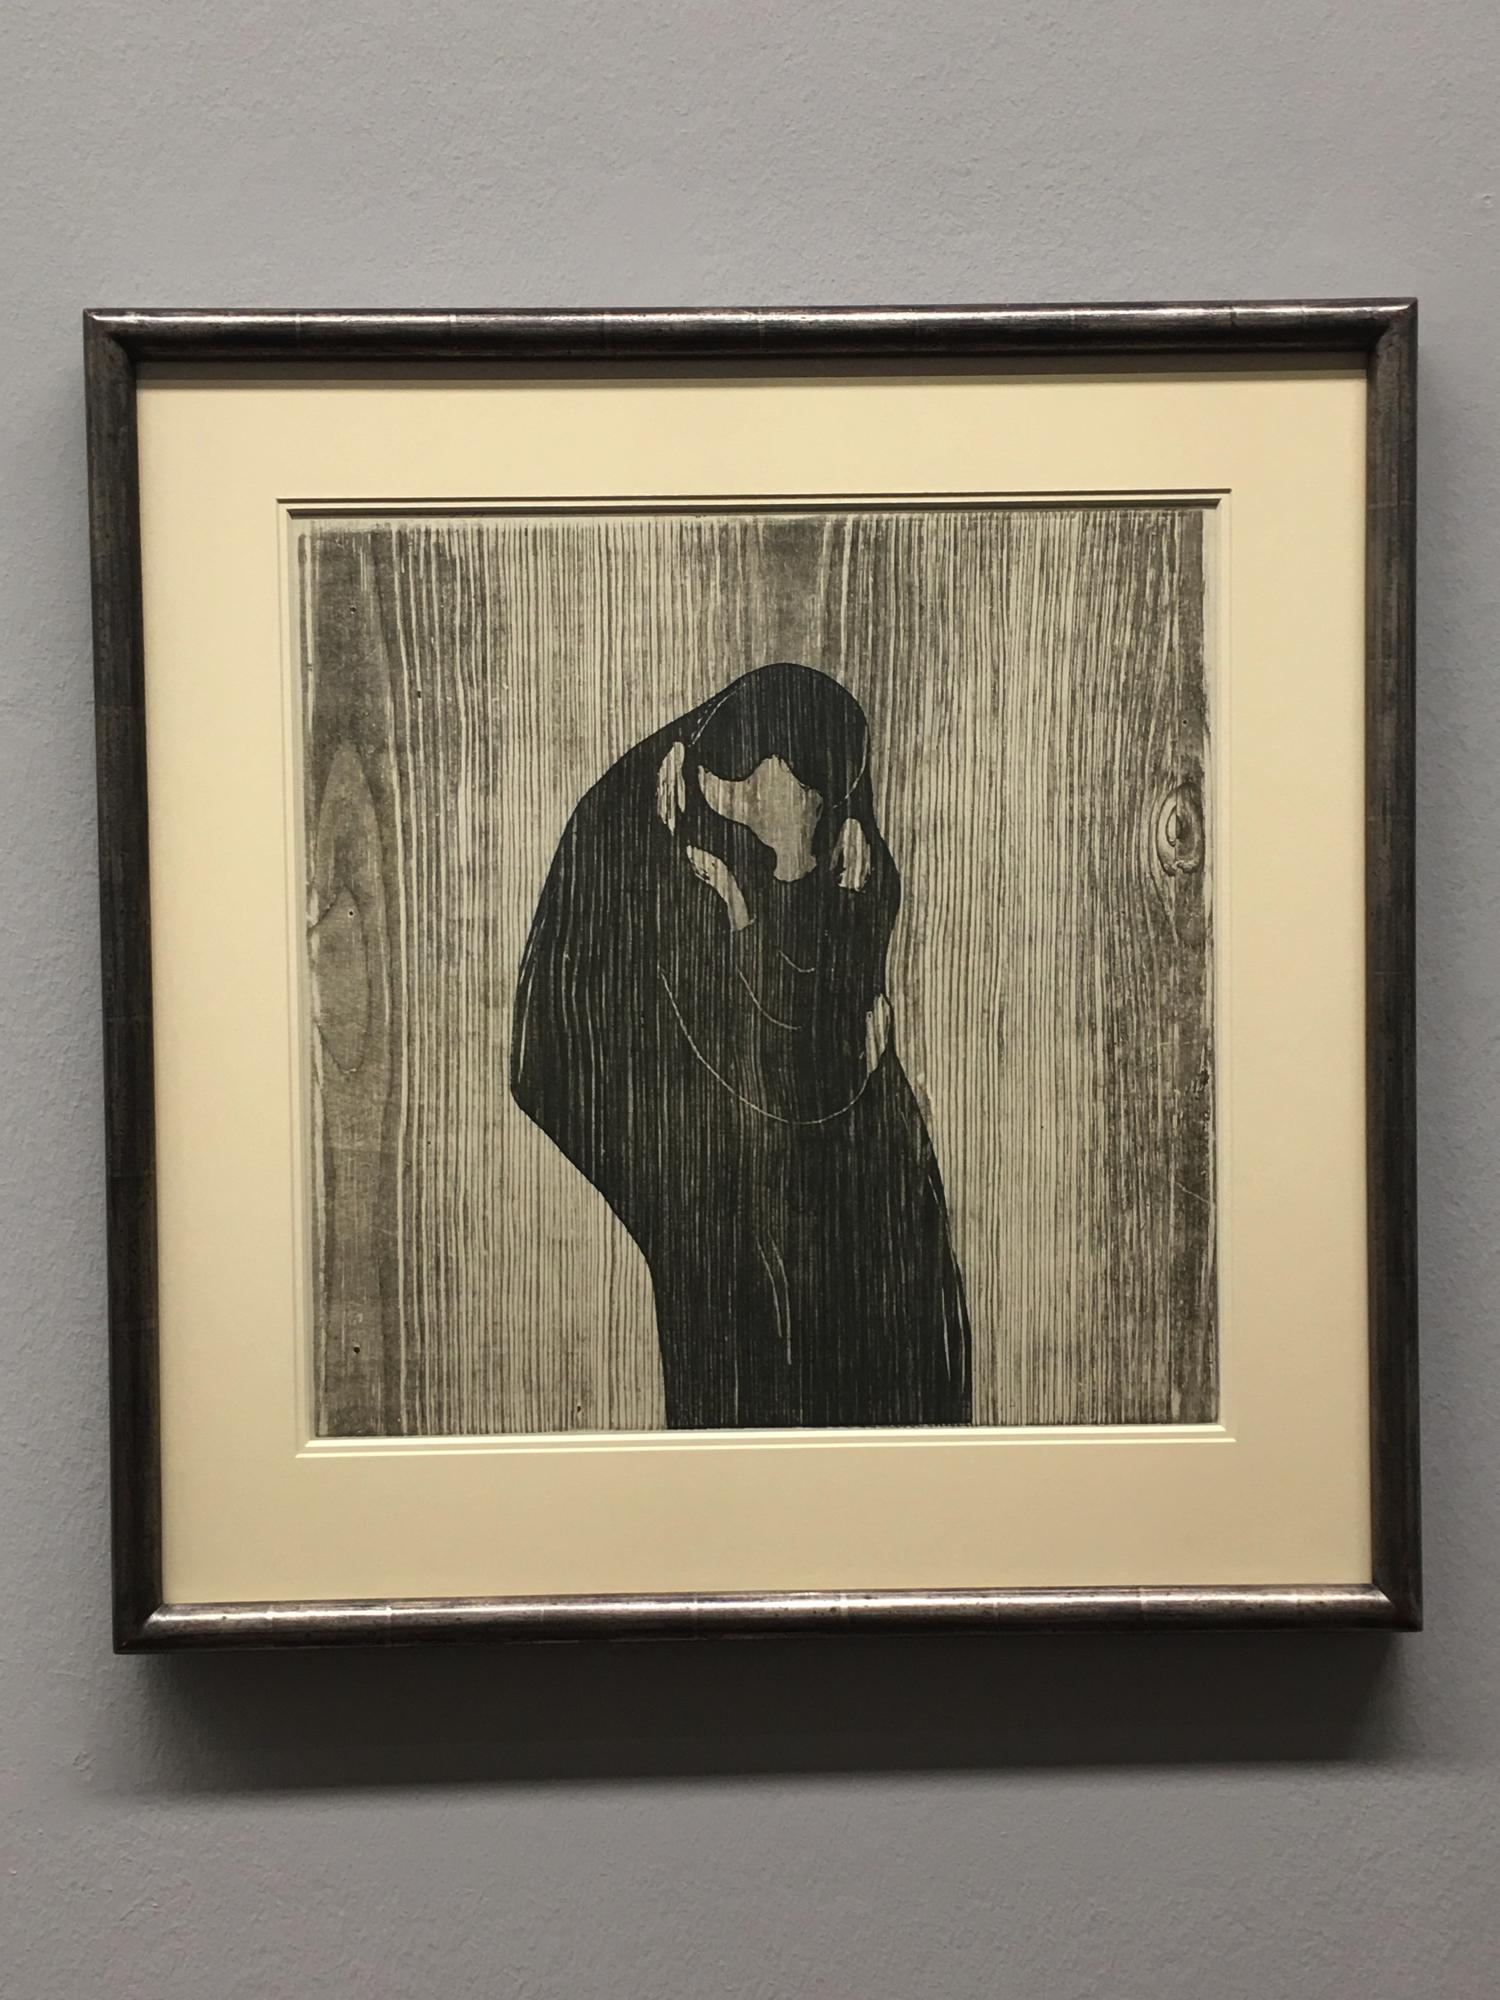 Edvard Munch, The Kiss IV, 1902, Albertina Museum, Vienna